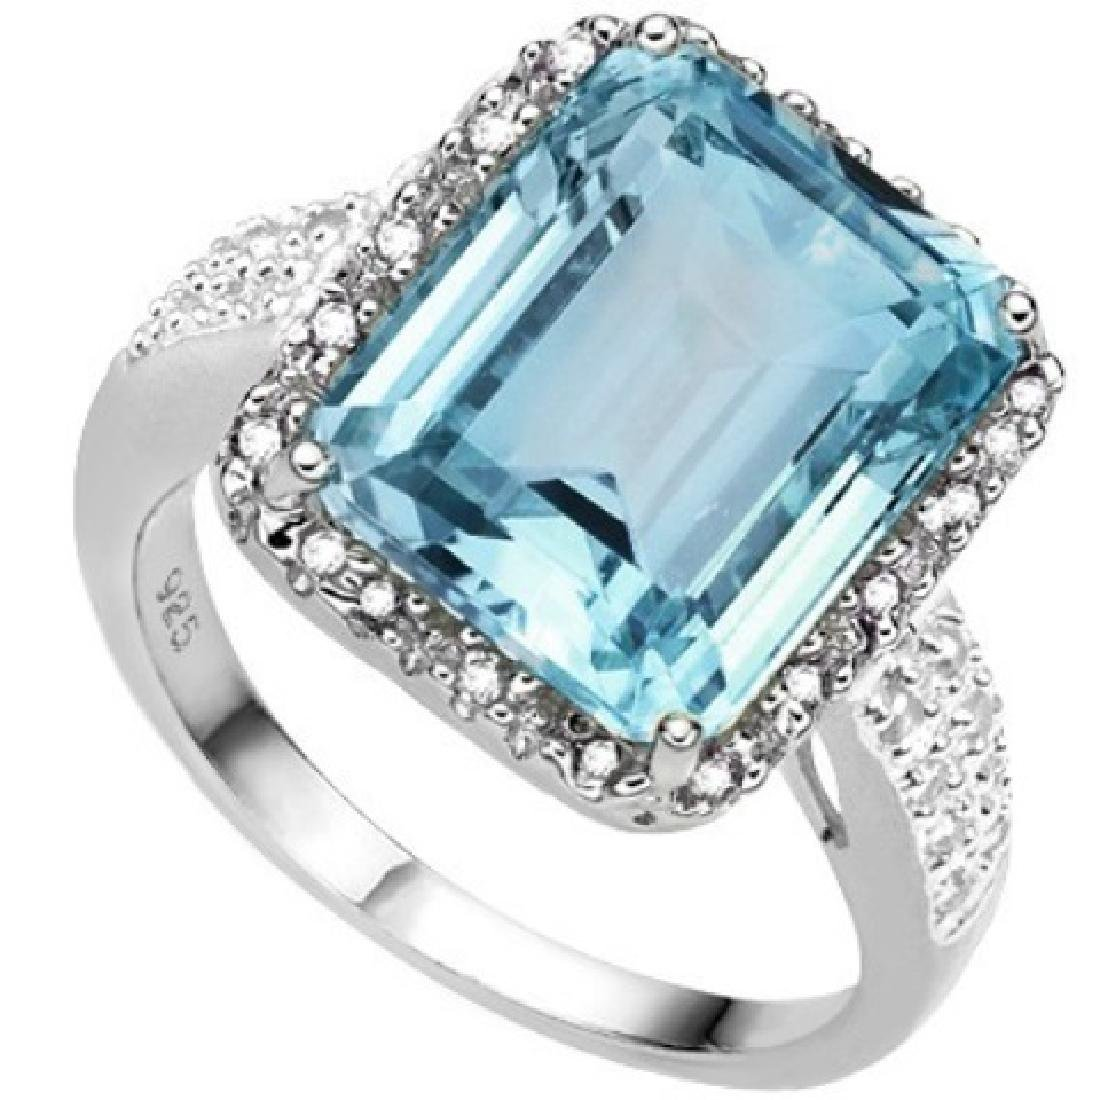 GORGEOUS 7CT HUGE BLUE TOPAZ/DIAMOND CUT RING